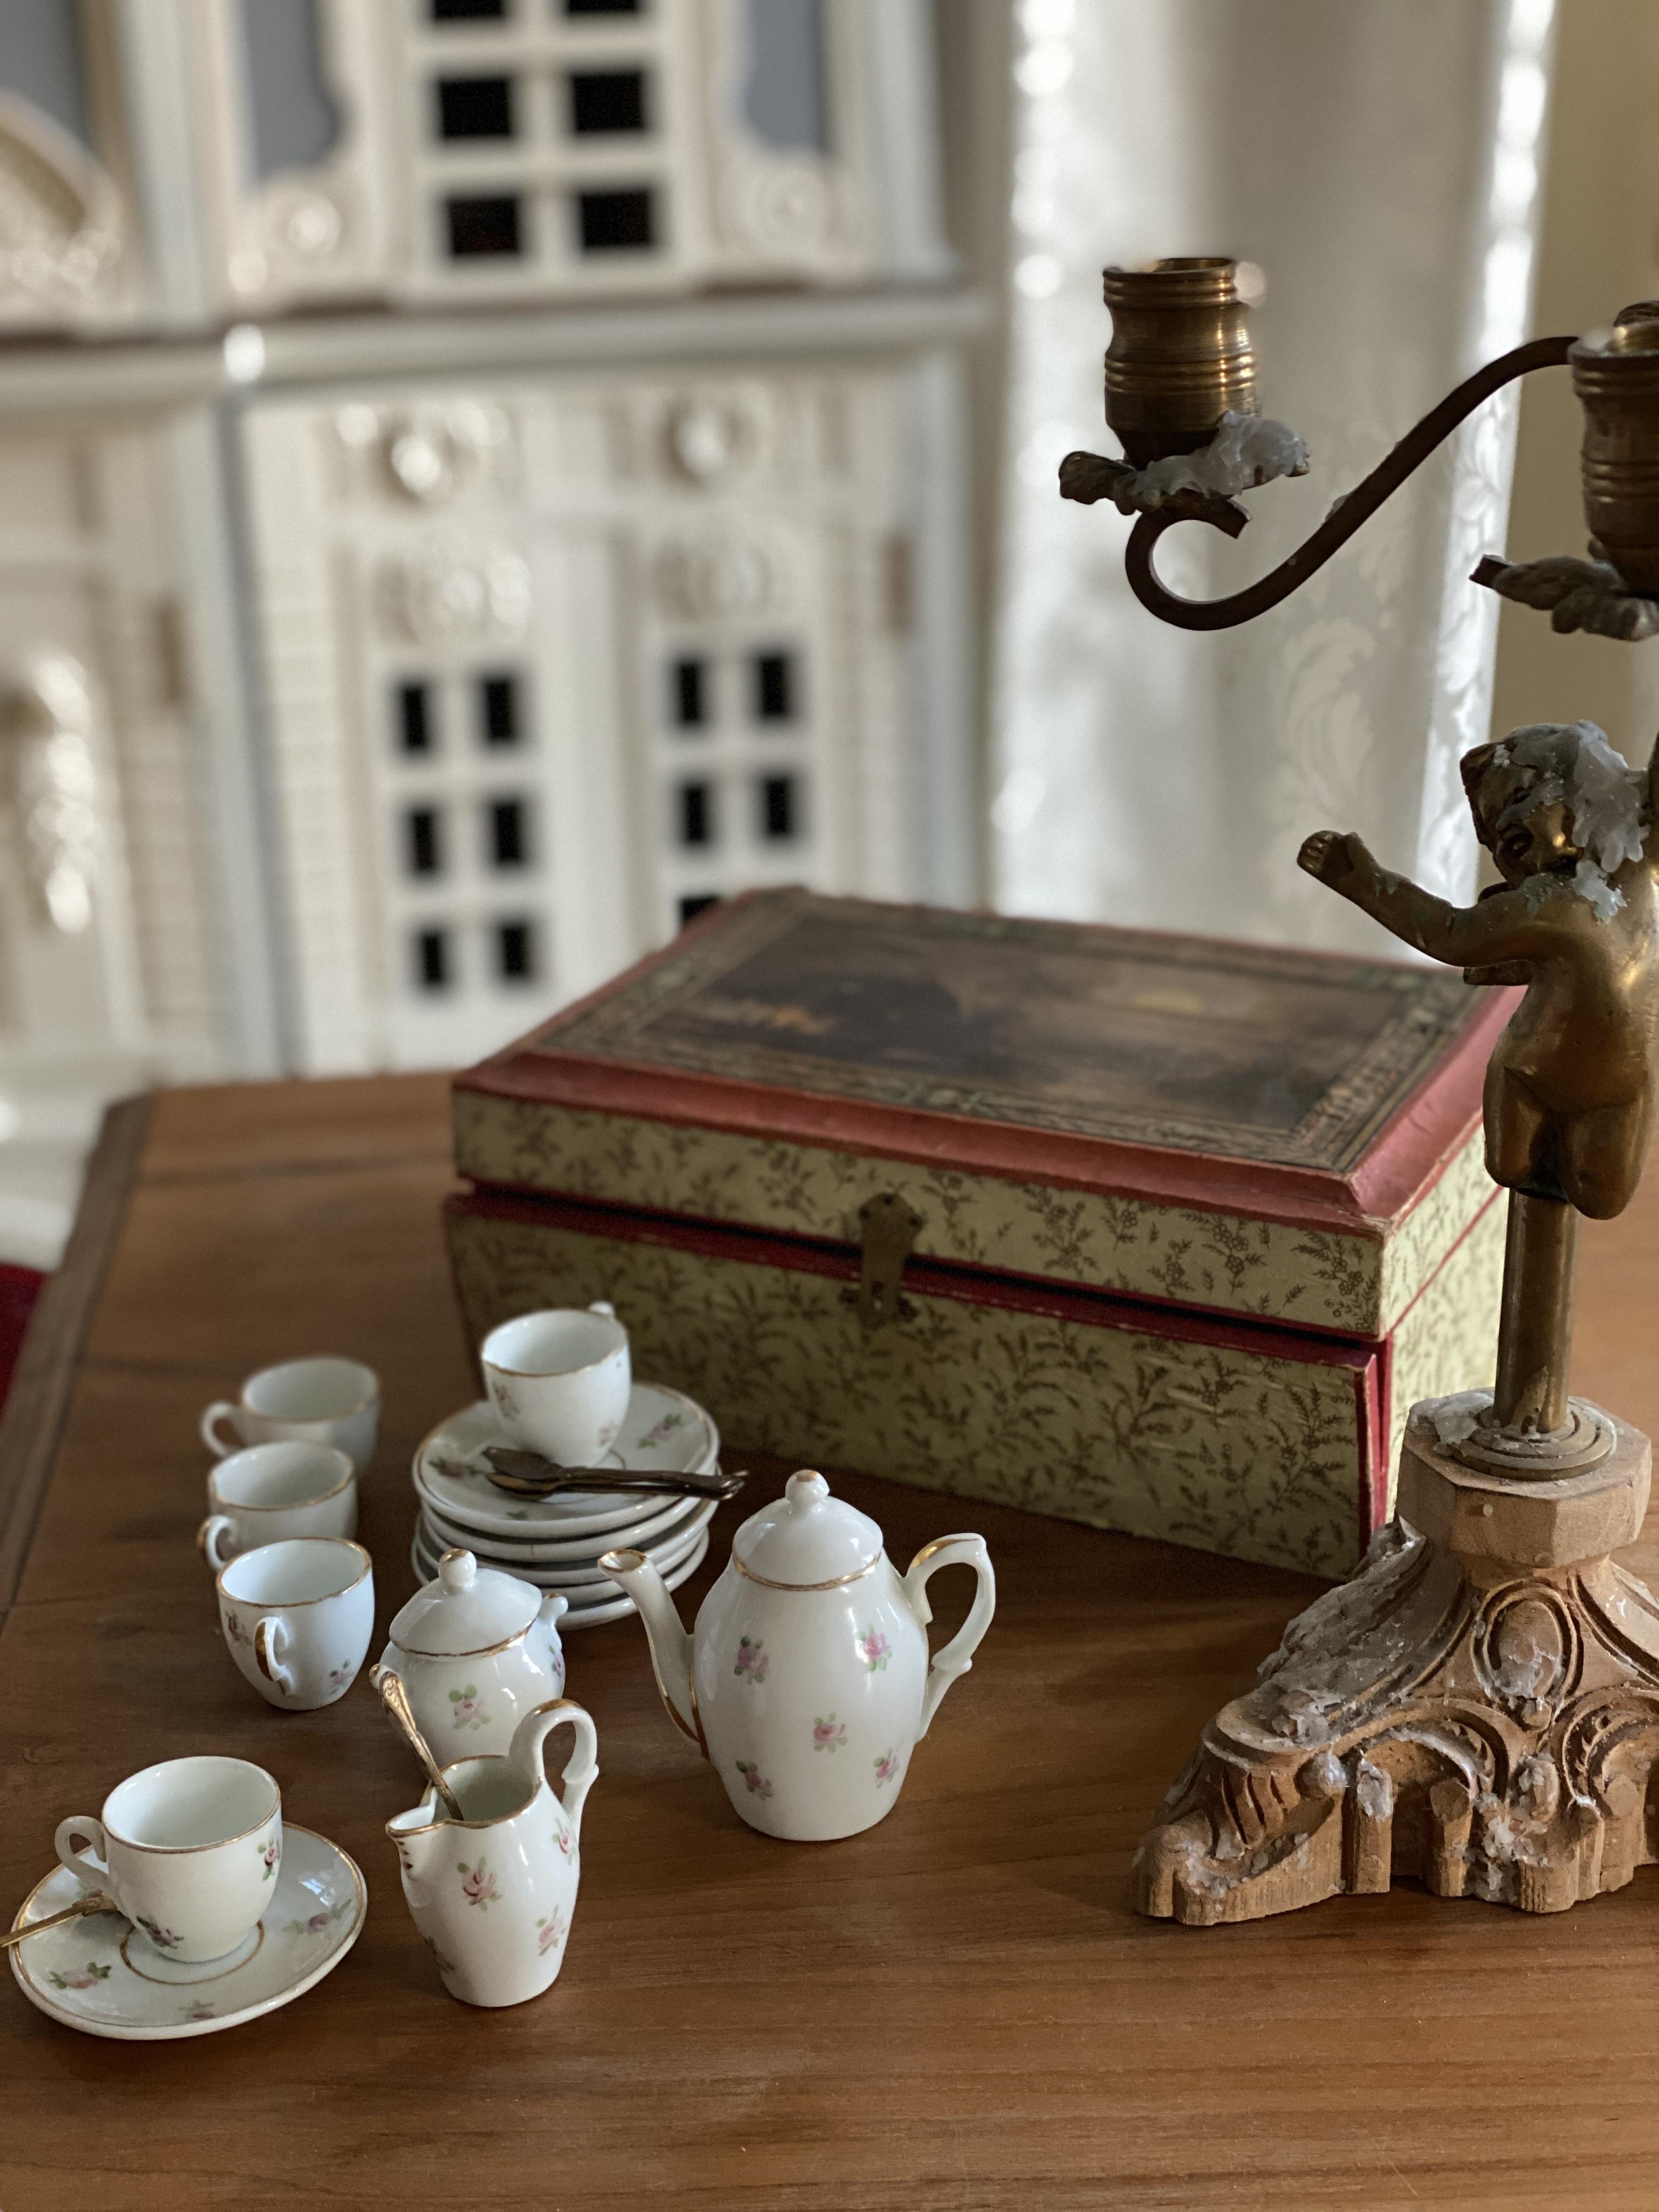 Children Decor Porcelain Lladro Tea set French decor